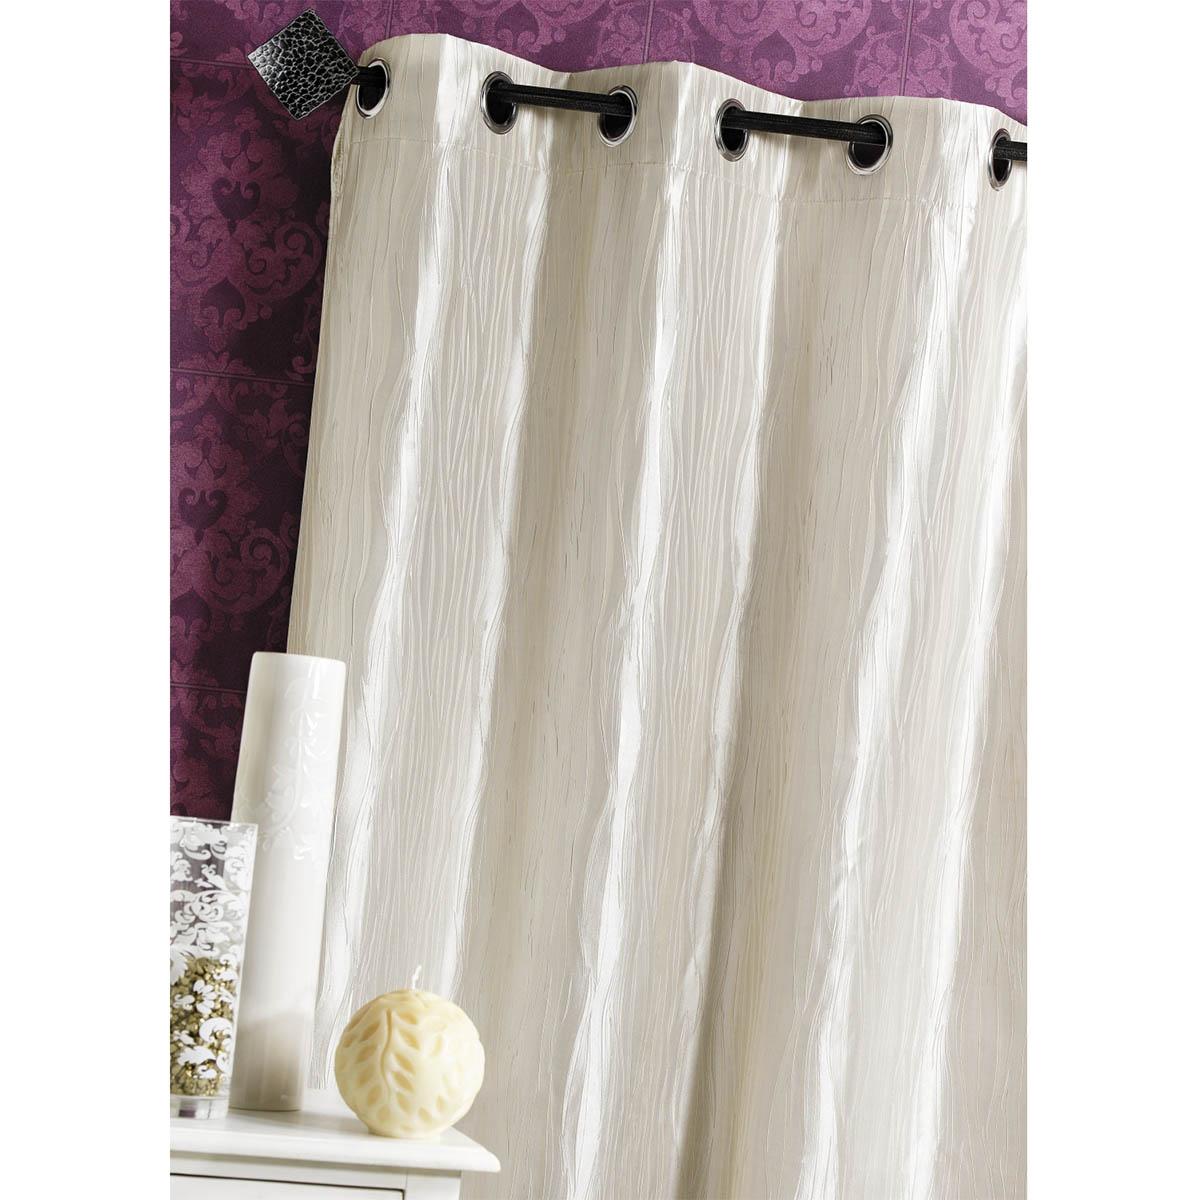 rideau d ameublement en taffetas froiss lin blanc. Black Bedroom Furniture Sets. Home Design Ideas